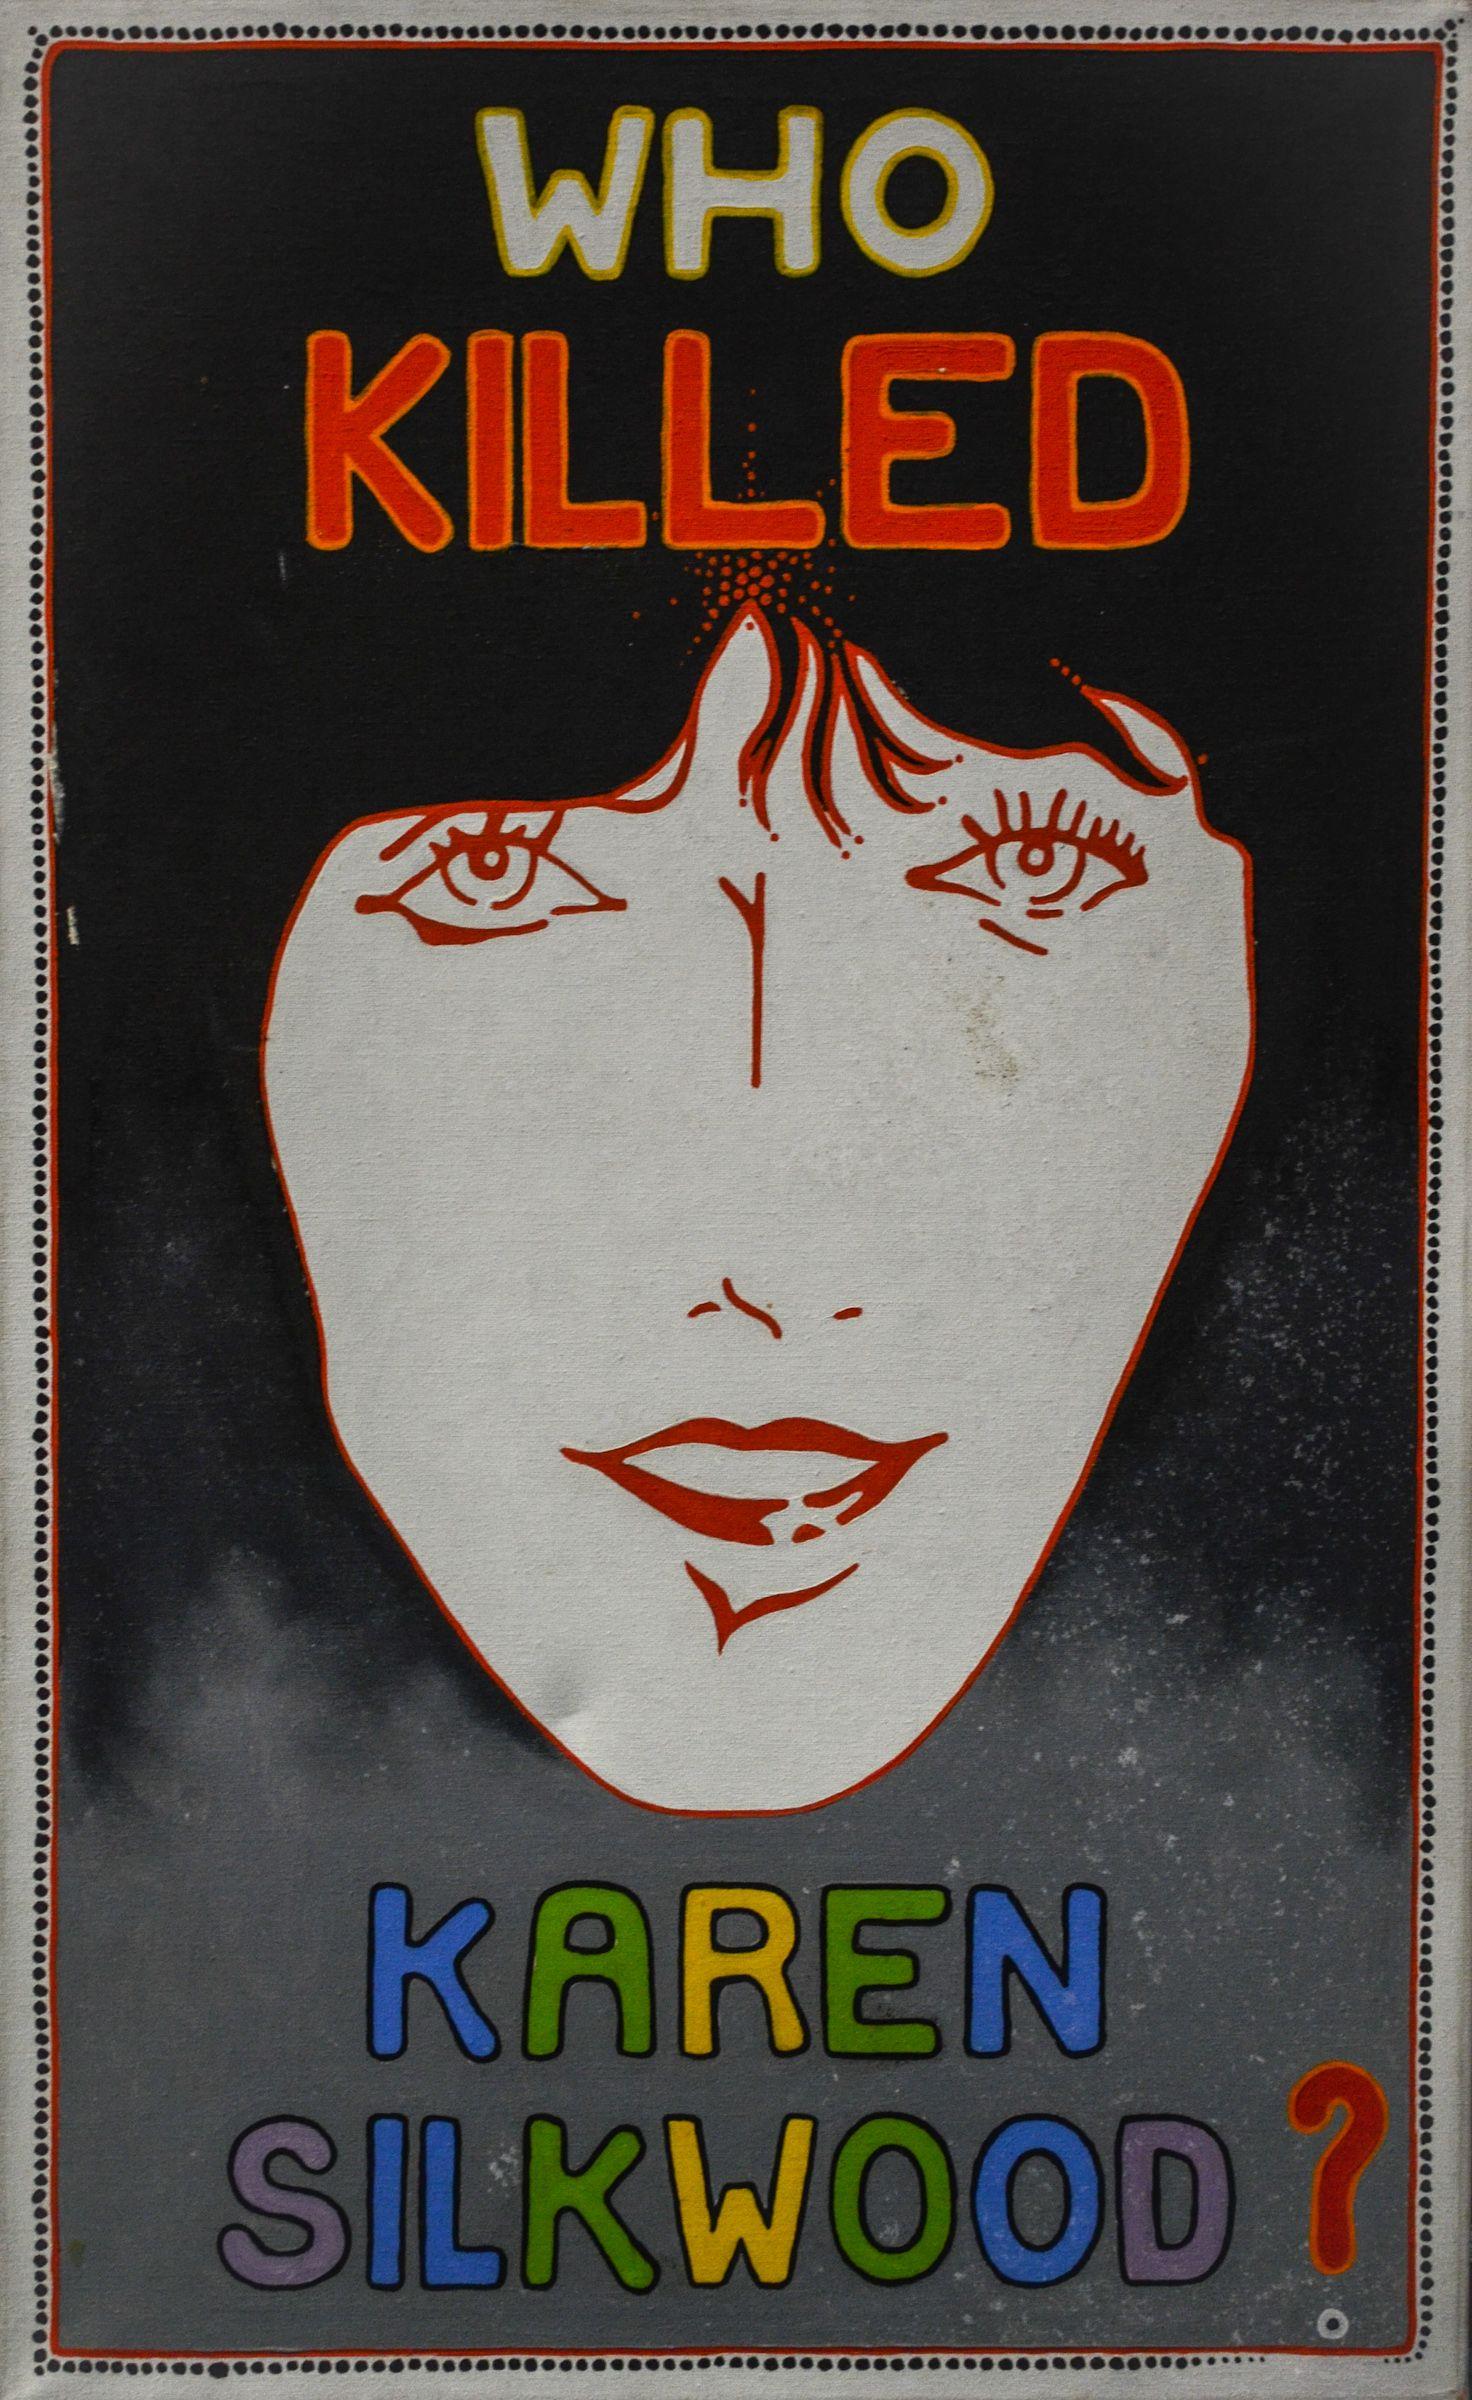 Cases Karen silkwood, Karen, History